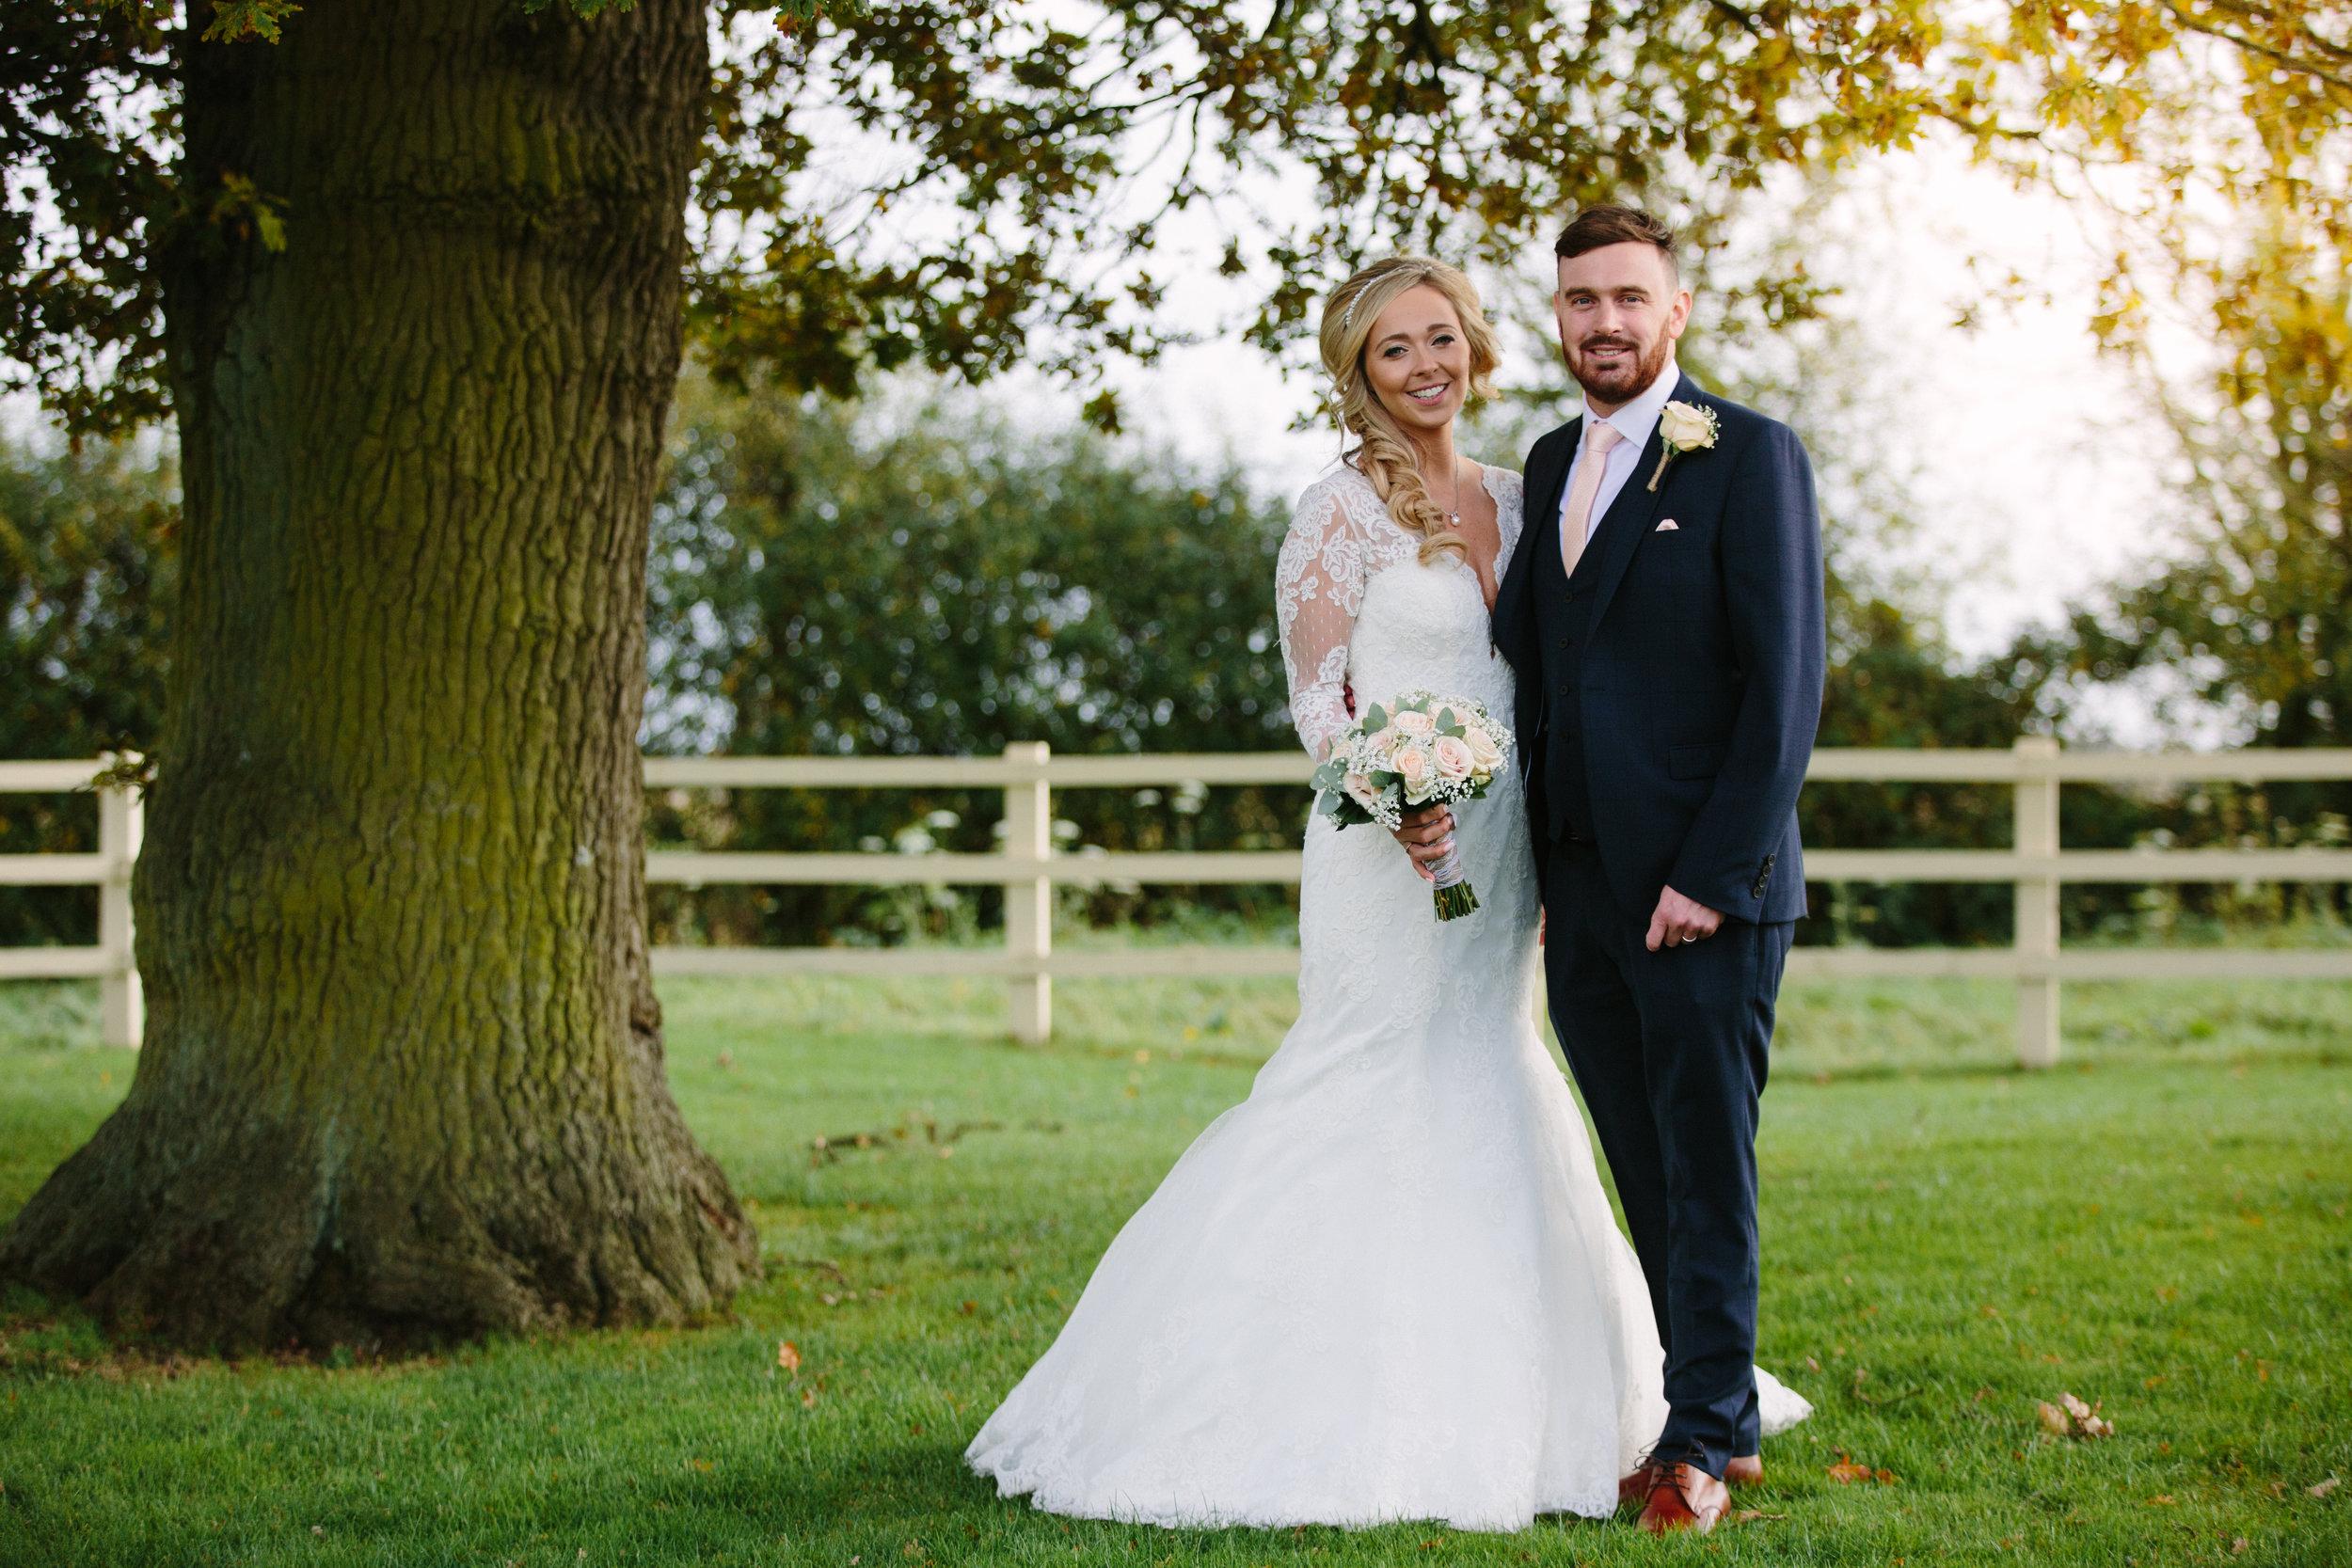 london-hertfordshire-wedding-photography-milling-barn-portrait-201